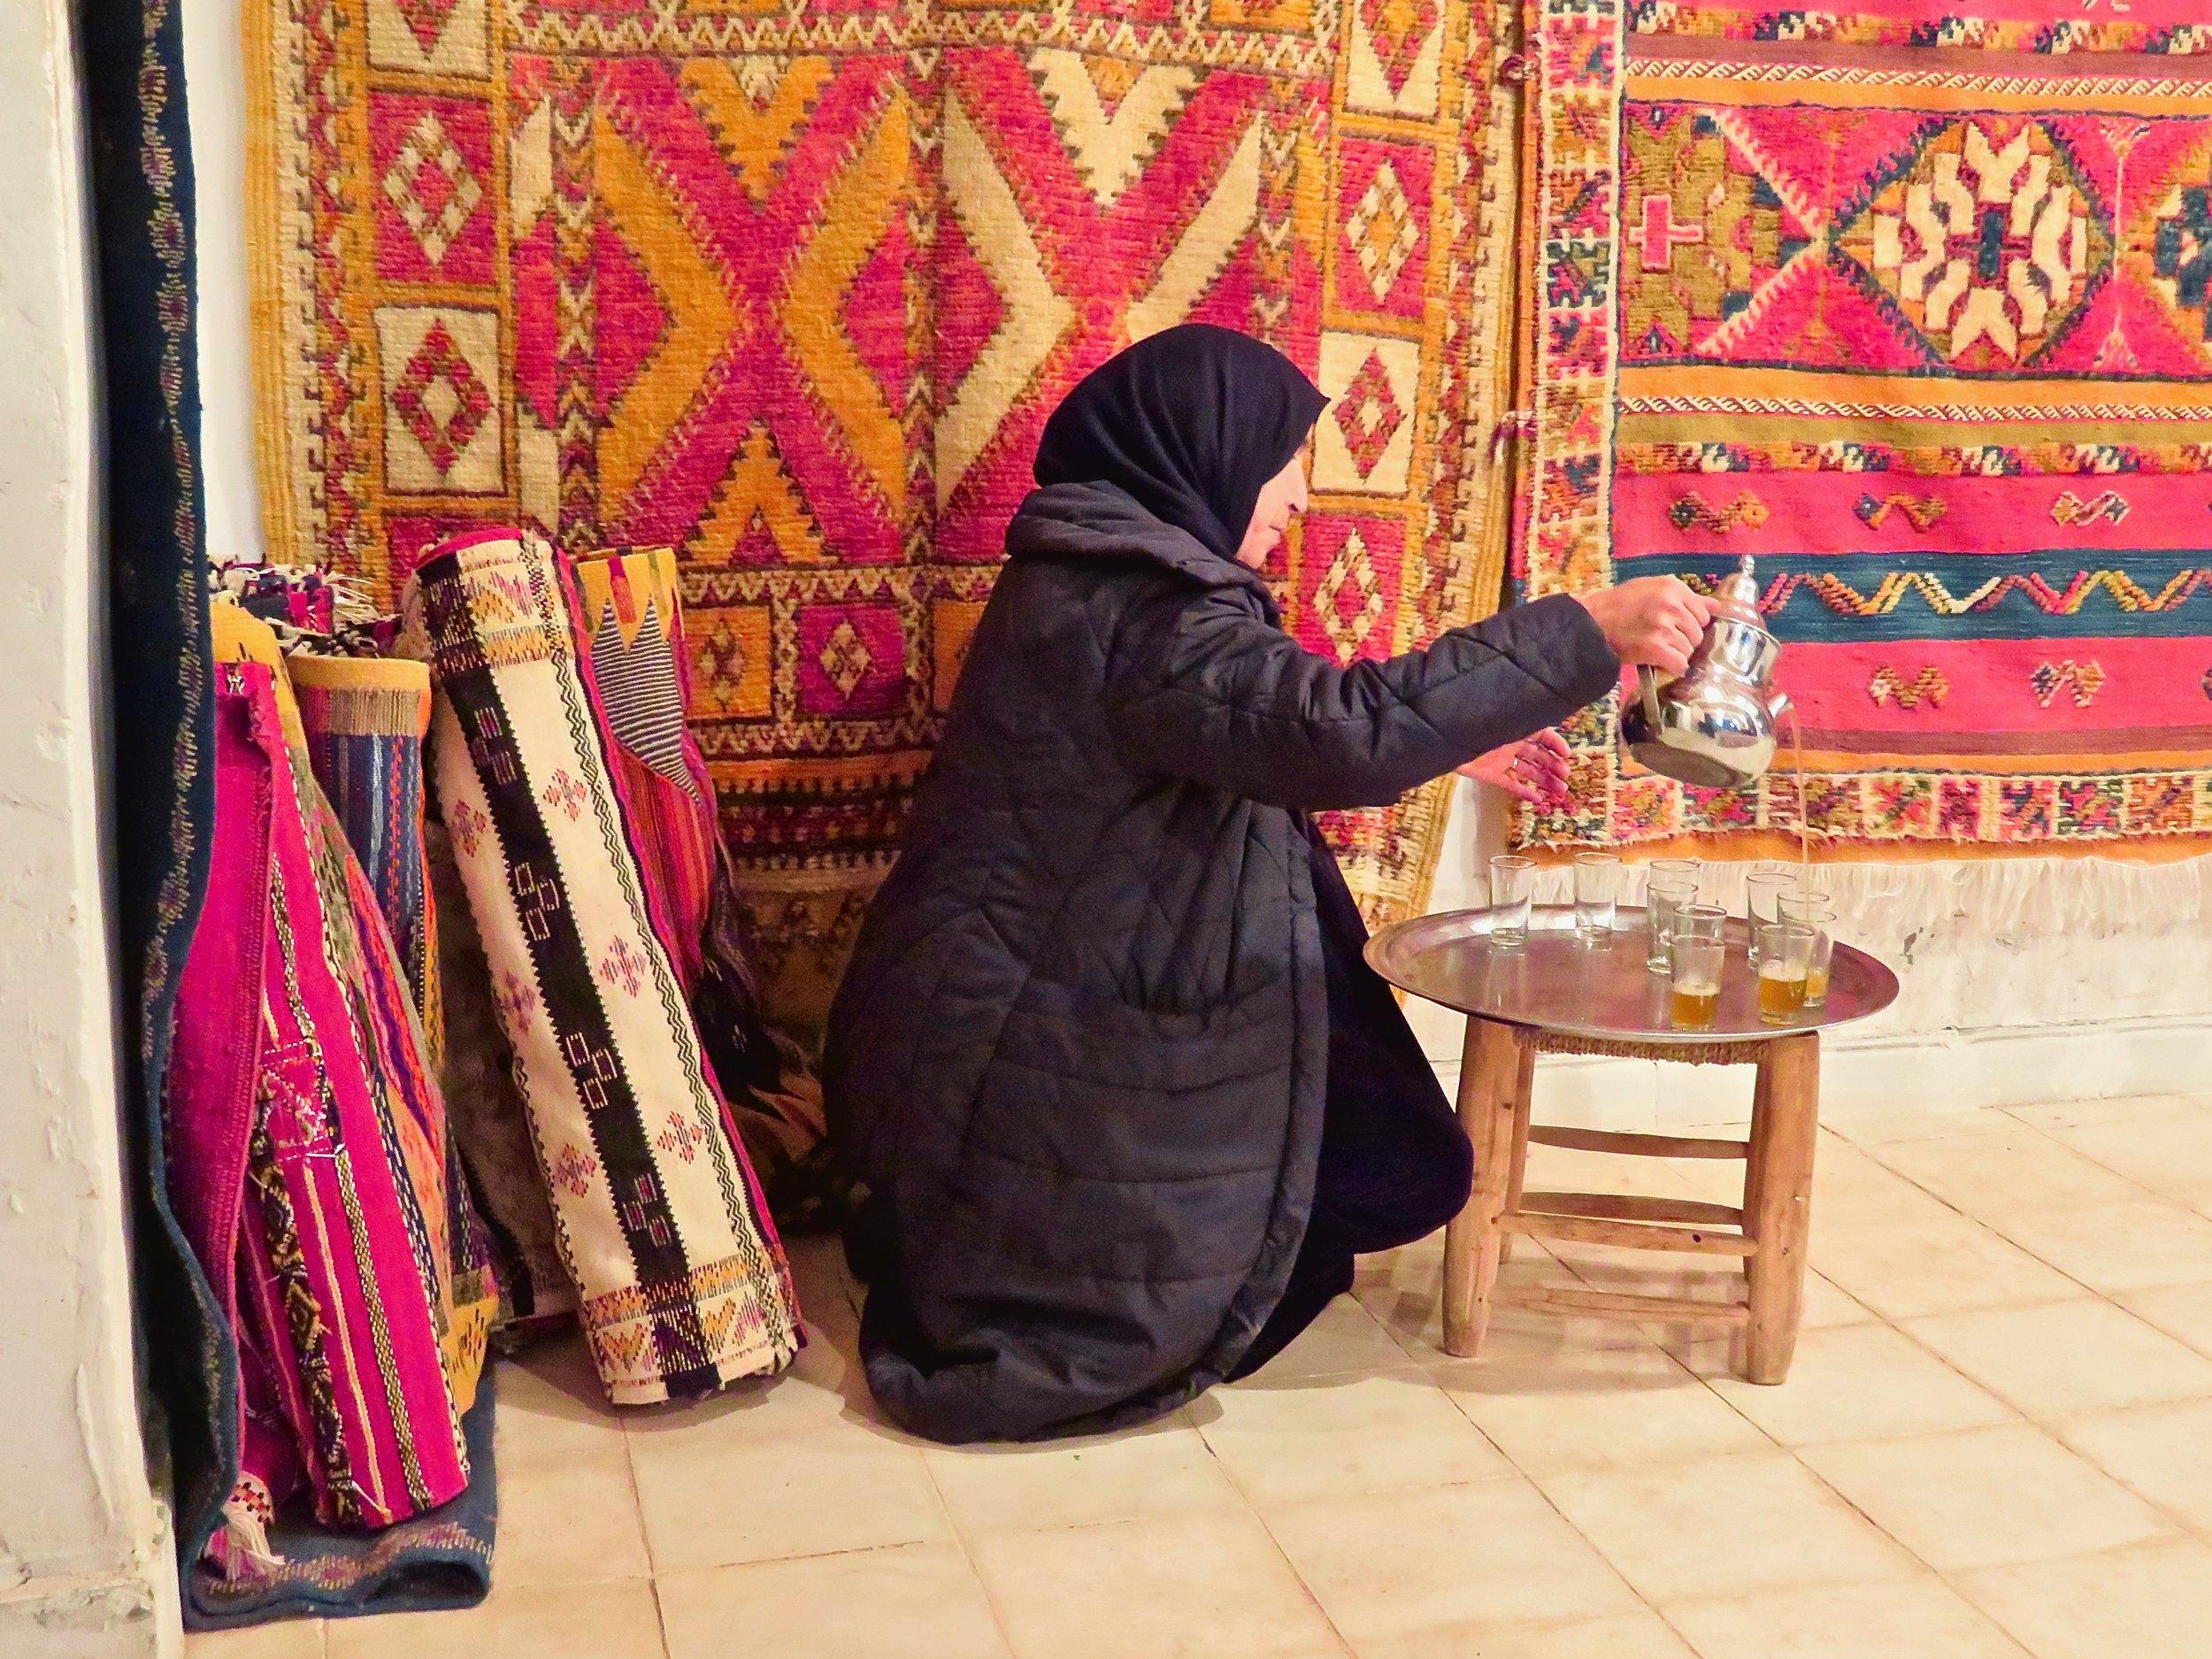 Pouring mint tea, a ritual at any good rug merchant's shop...